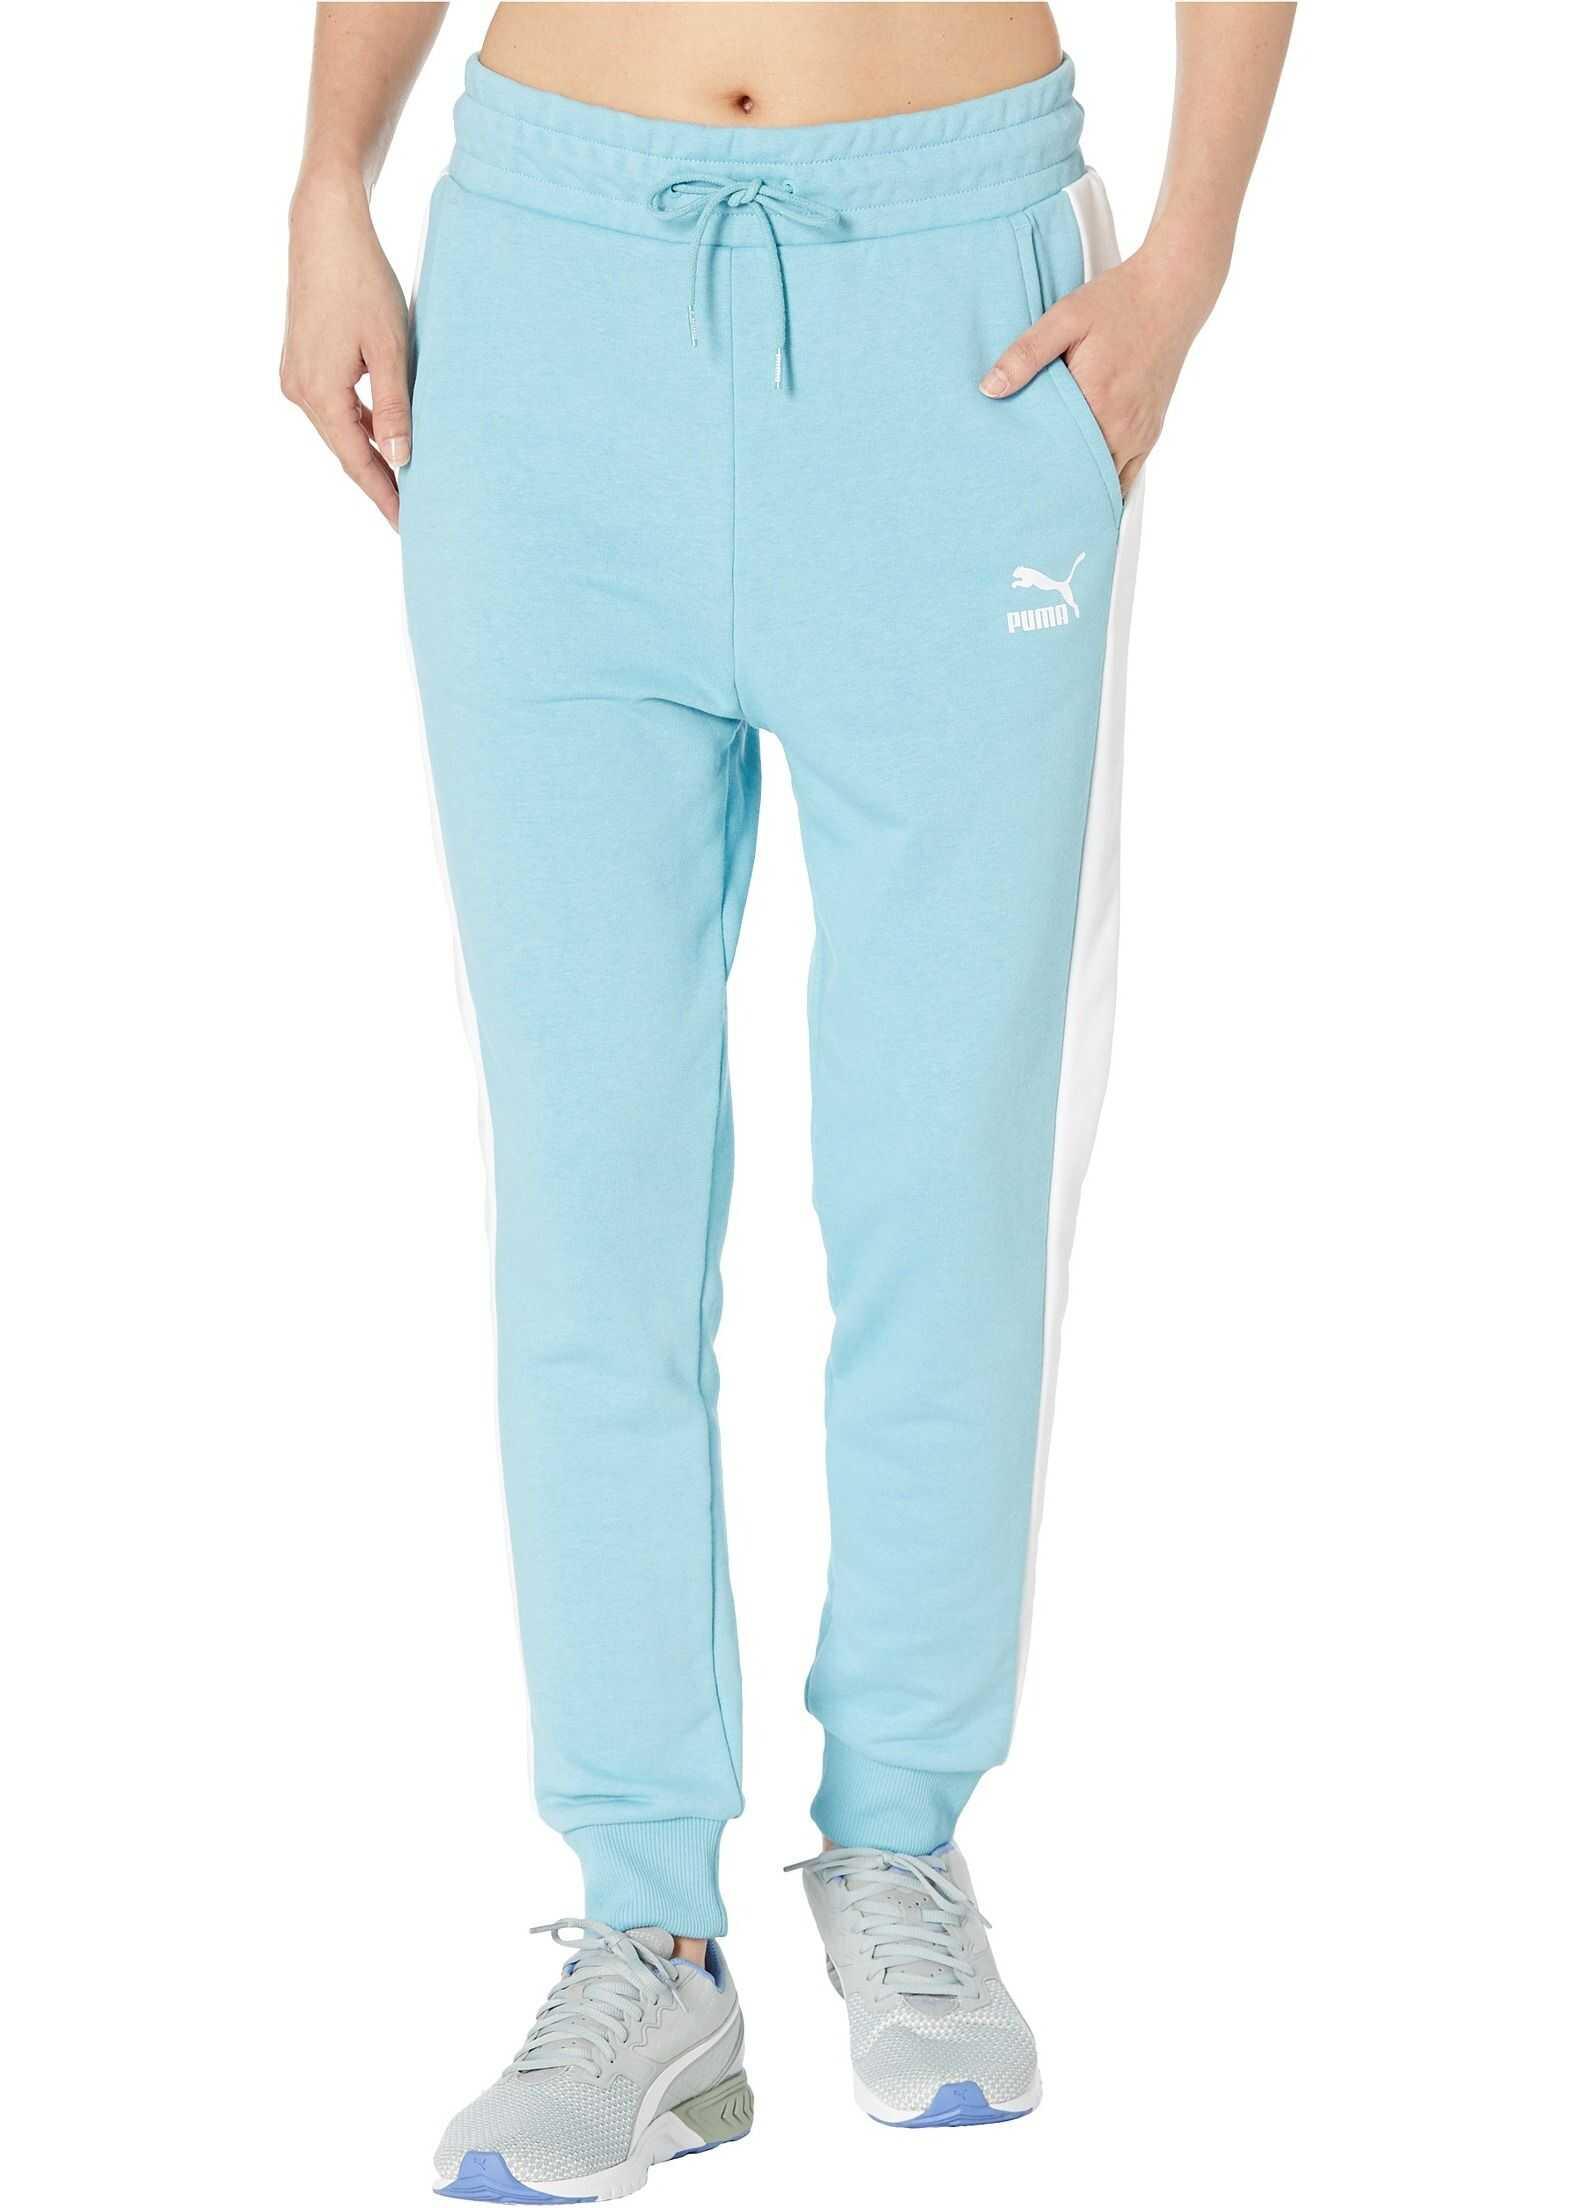 PUMA Classics T7 Track Pants Milky Blue